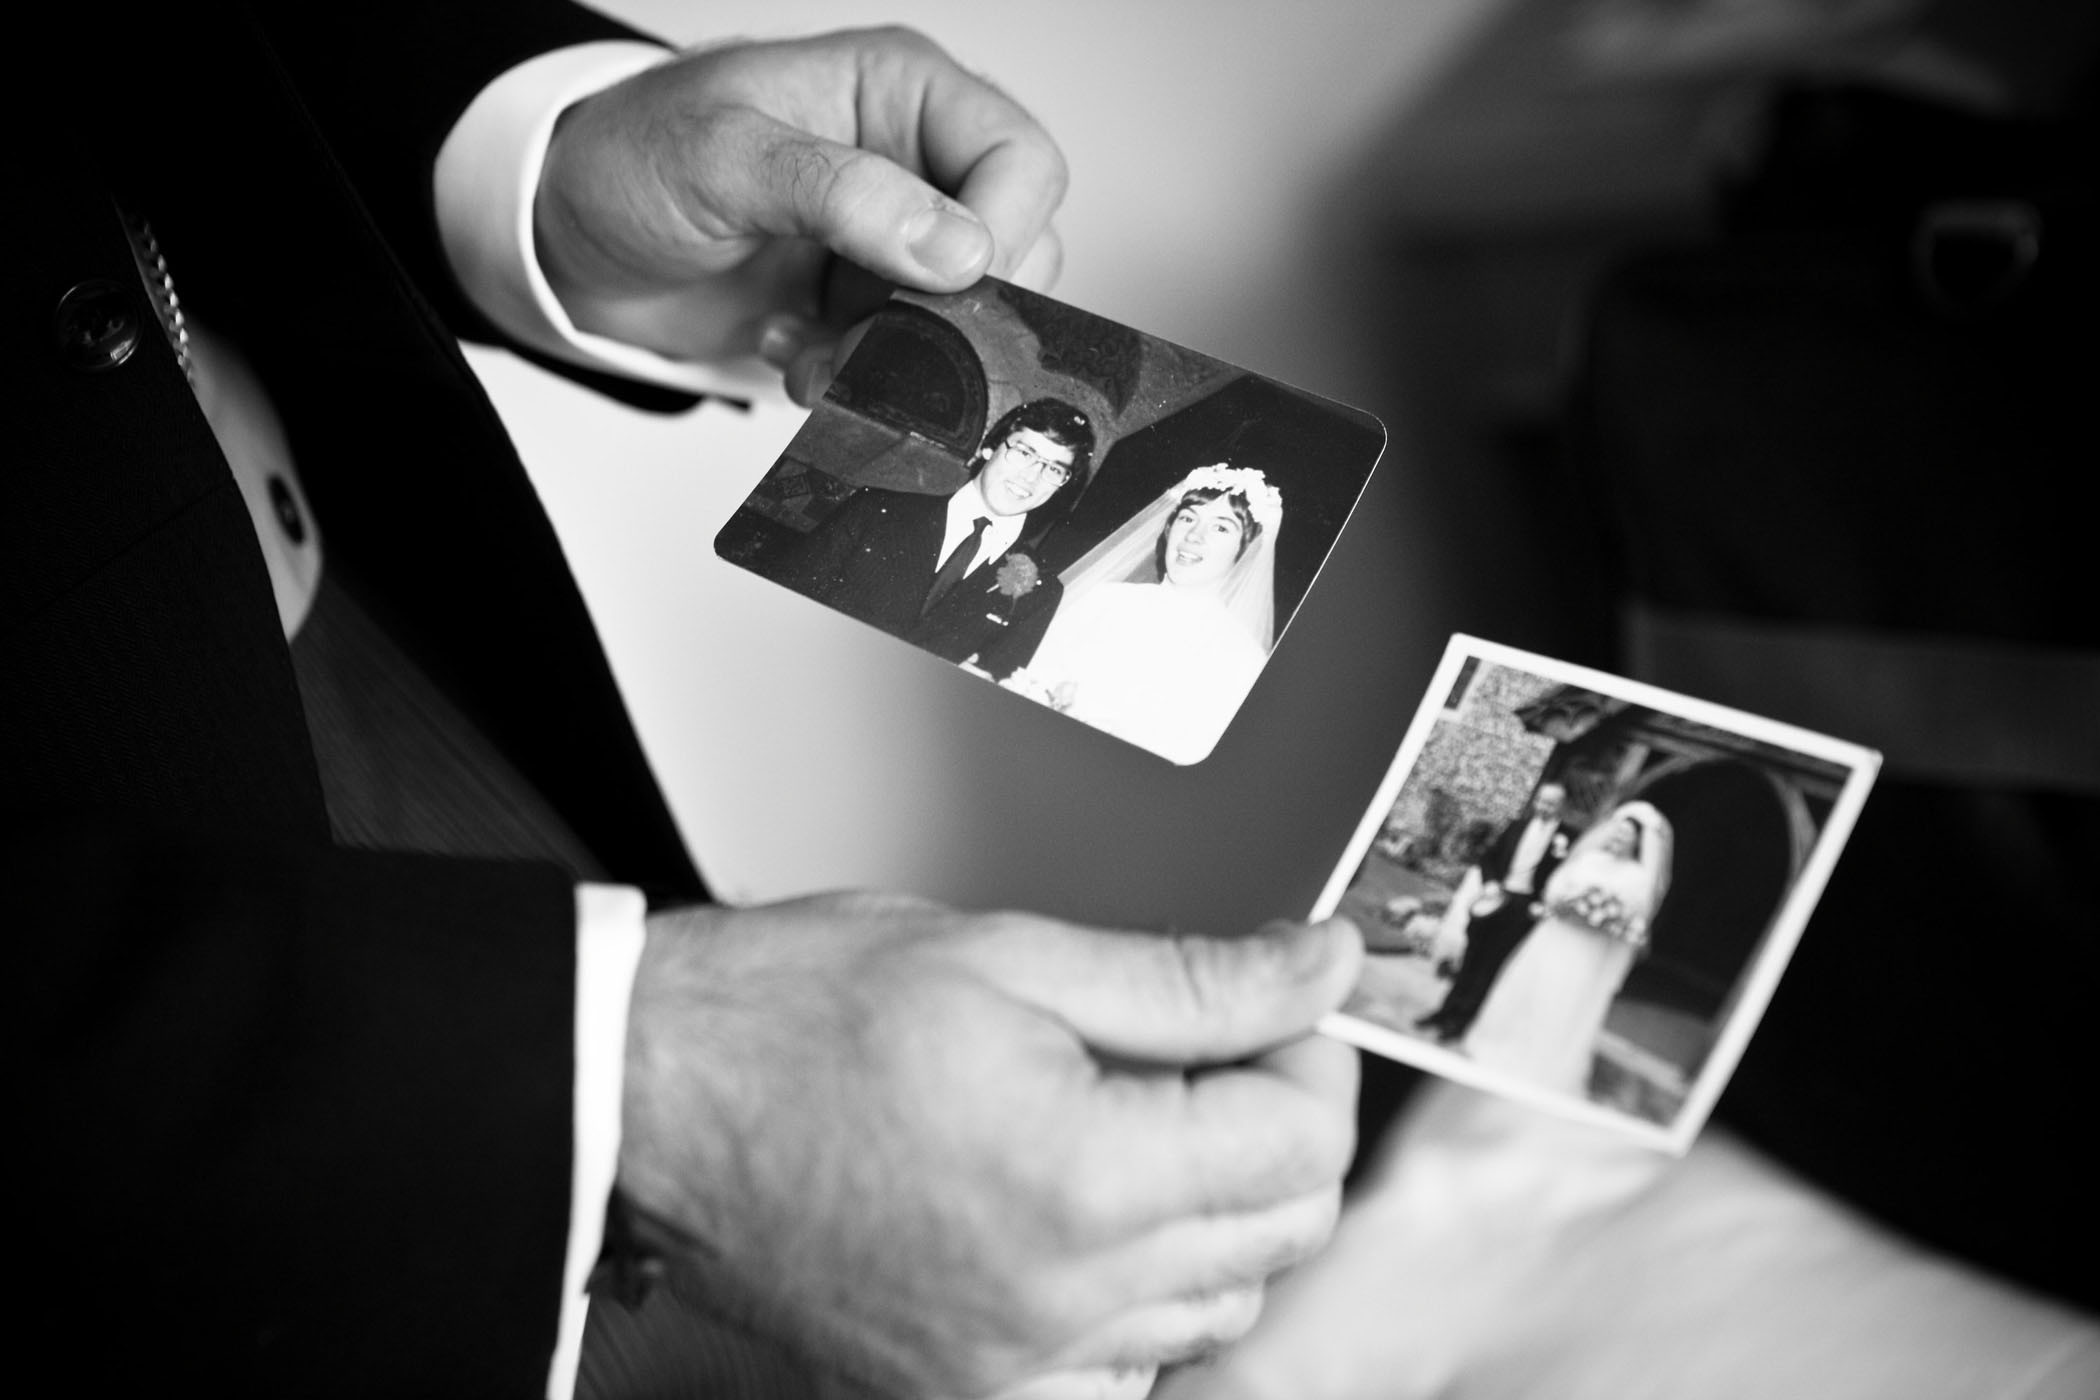 dan_burman_wedding_photography (13).jpg